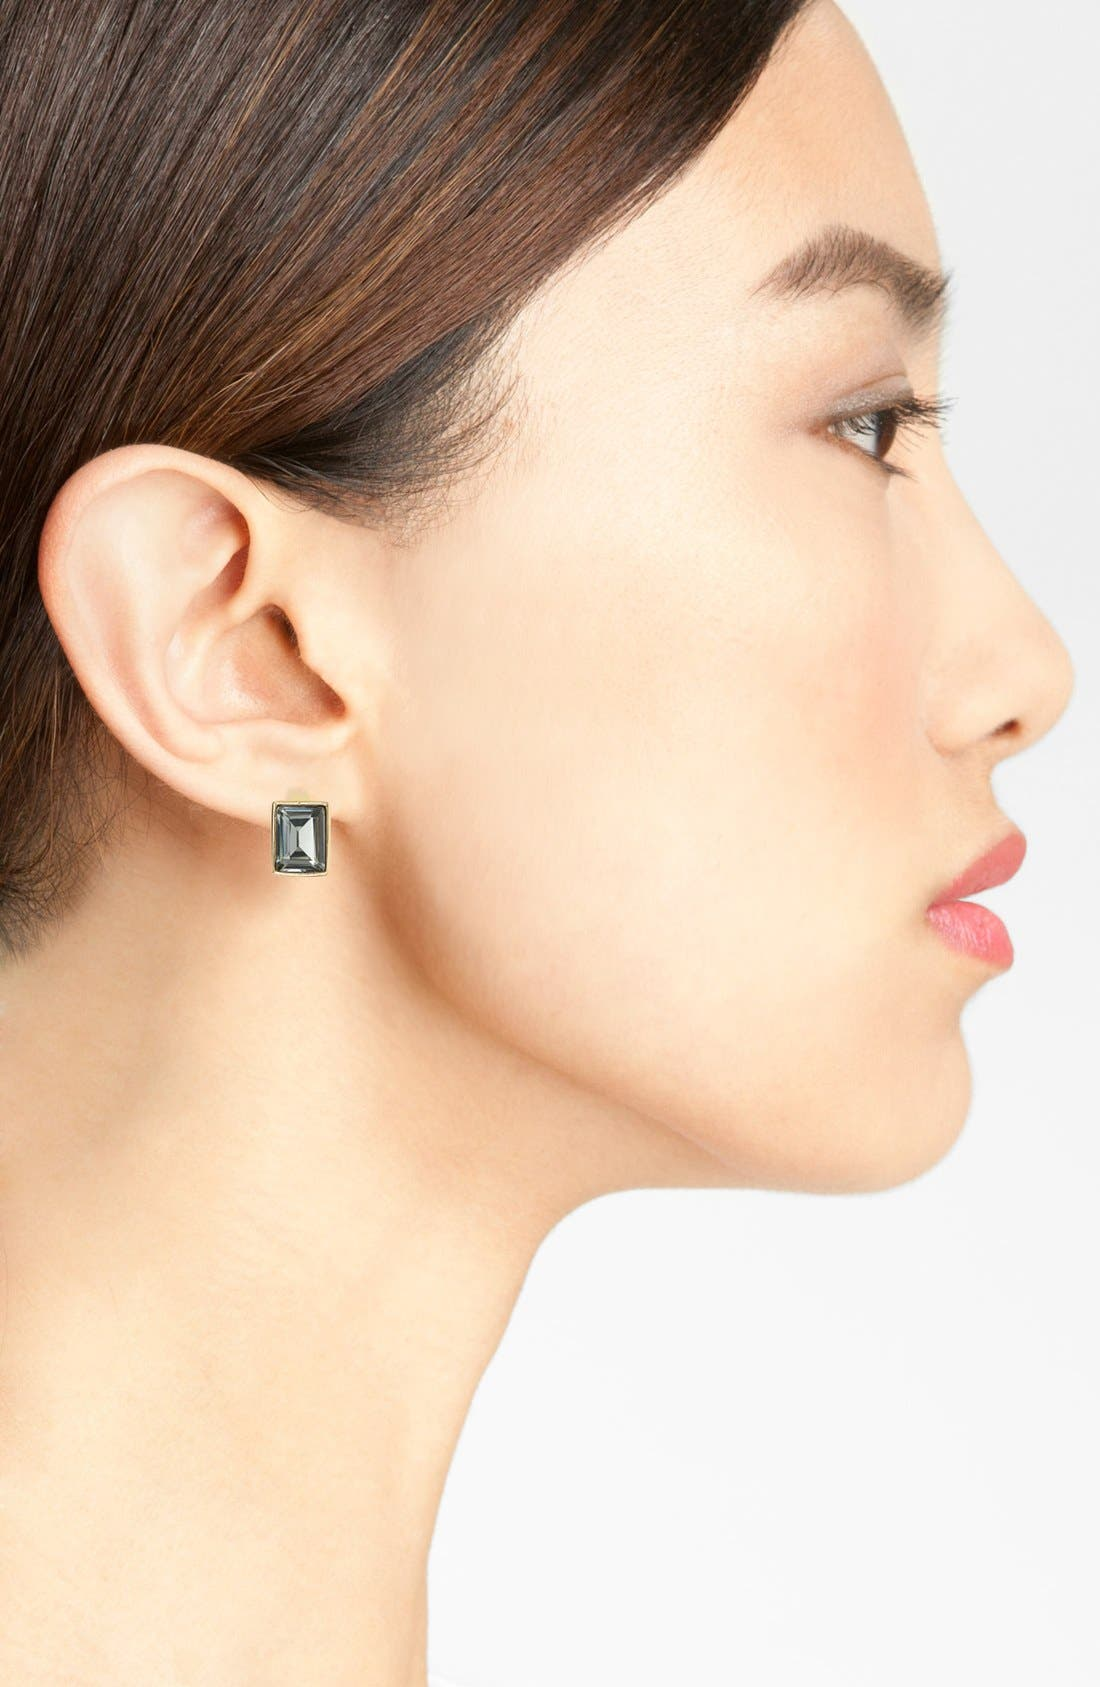 Alternate Image 2  - Vince Camuto 'Luxe Links' Small Hoop Earrings